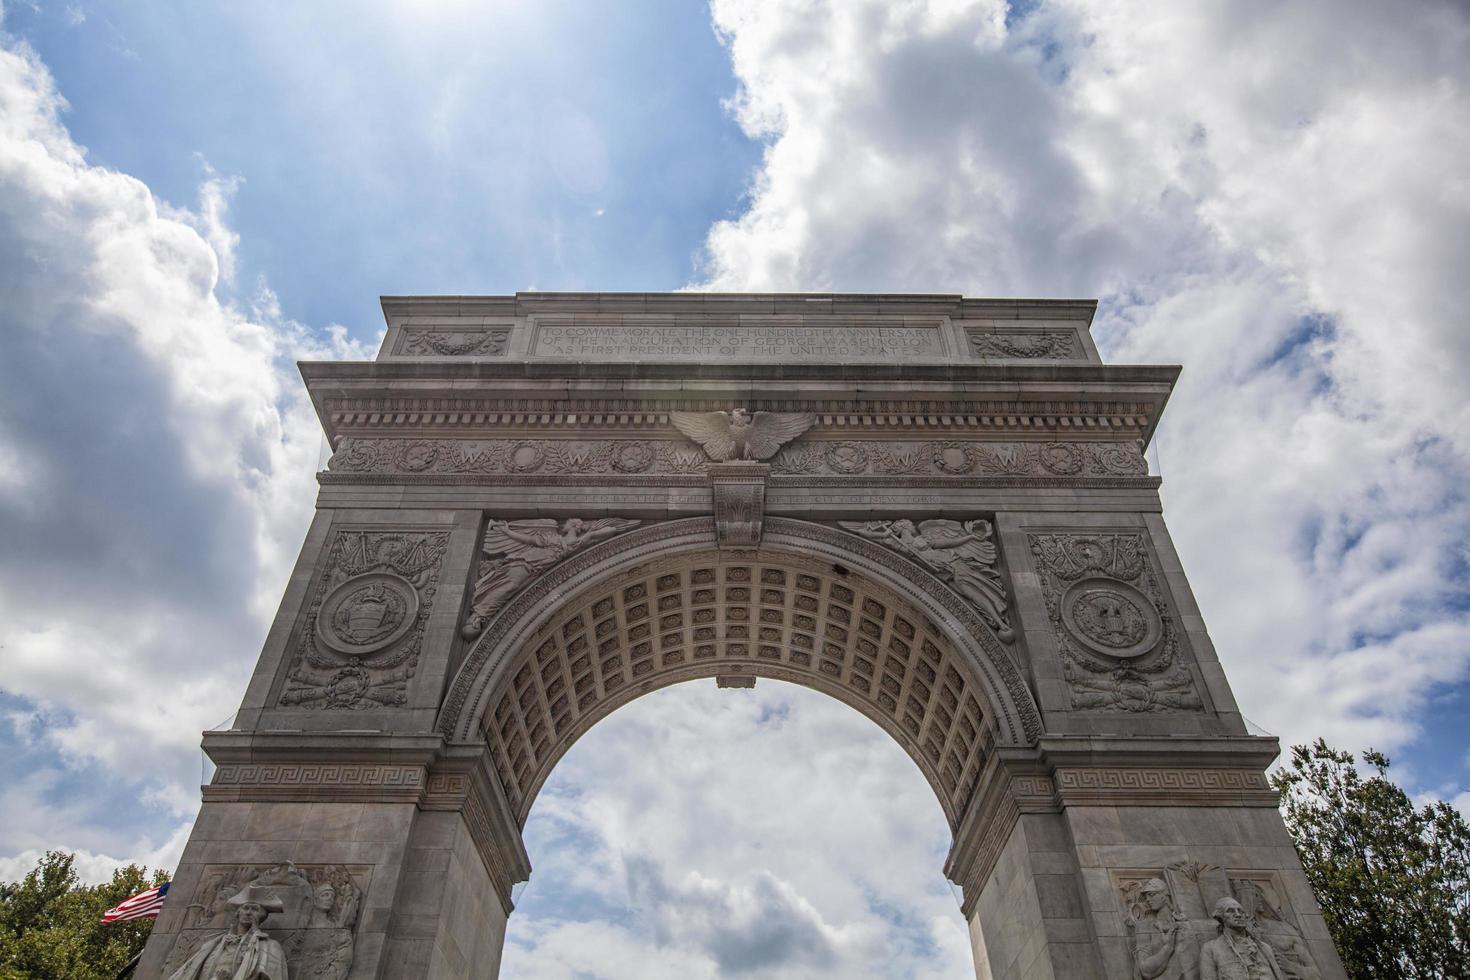 Washington vierkant monument in de stad van New York foto